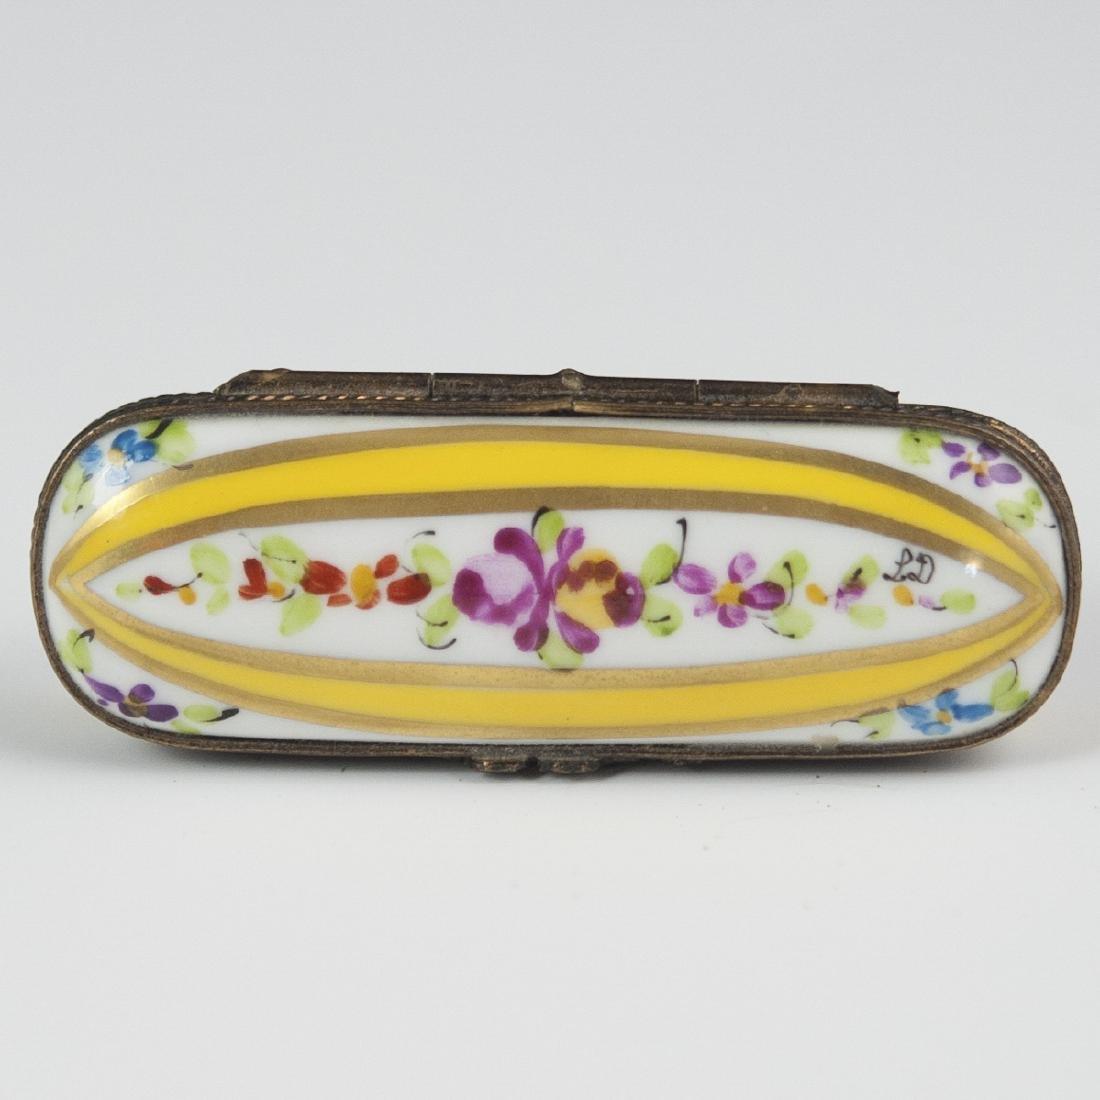 Limoges Porcelain Needle Box - 2